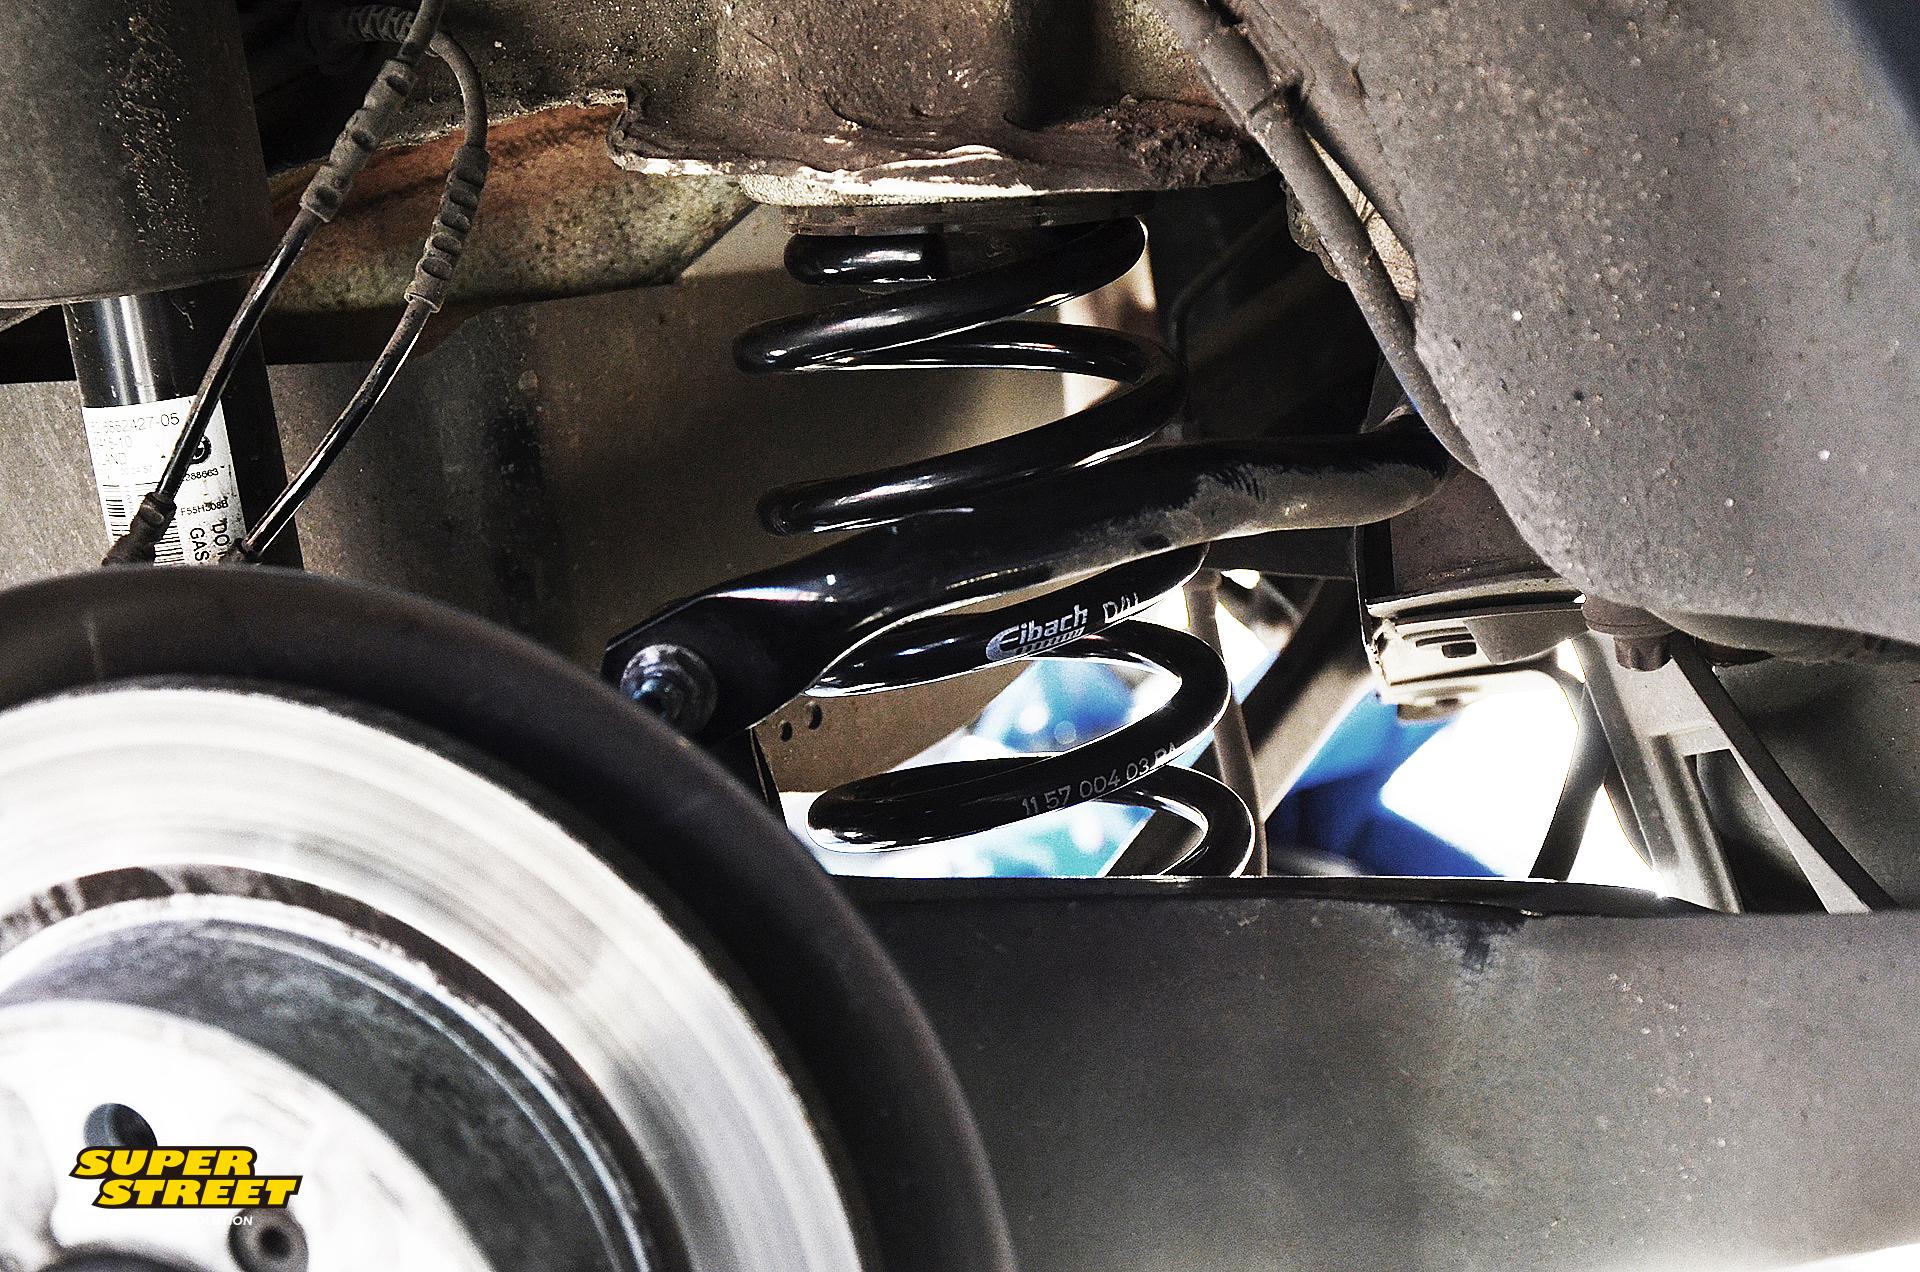 MINI Cooper F55改装Eibach短弹簧